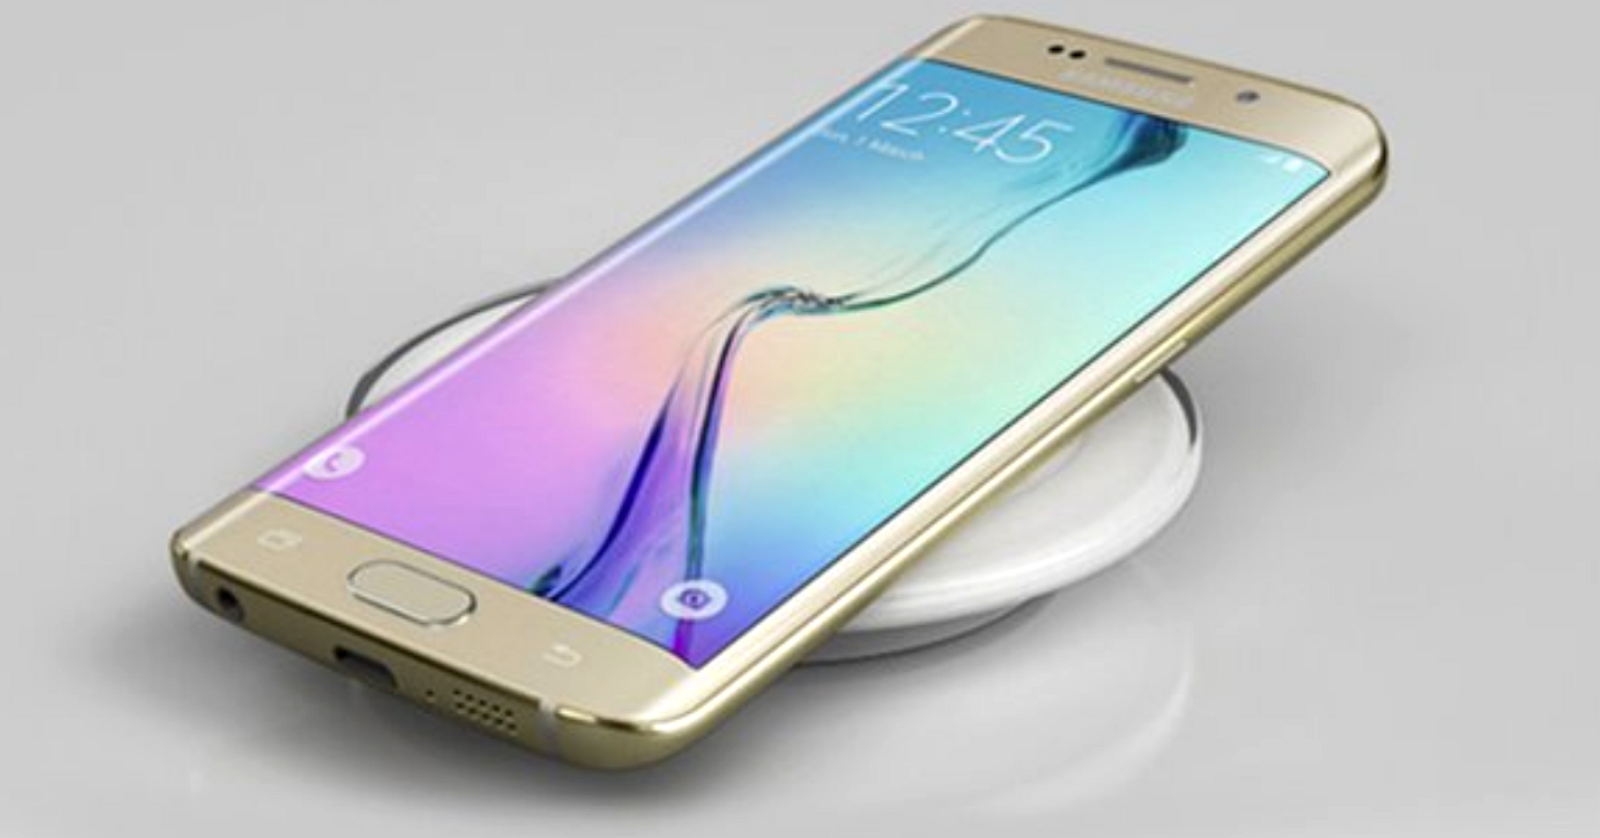 samsung galaxy s7 specs bestv phones. Black Bedroom Furniture Sets. Home Design Ideas